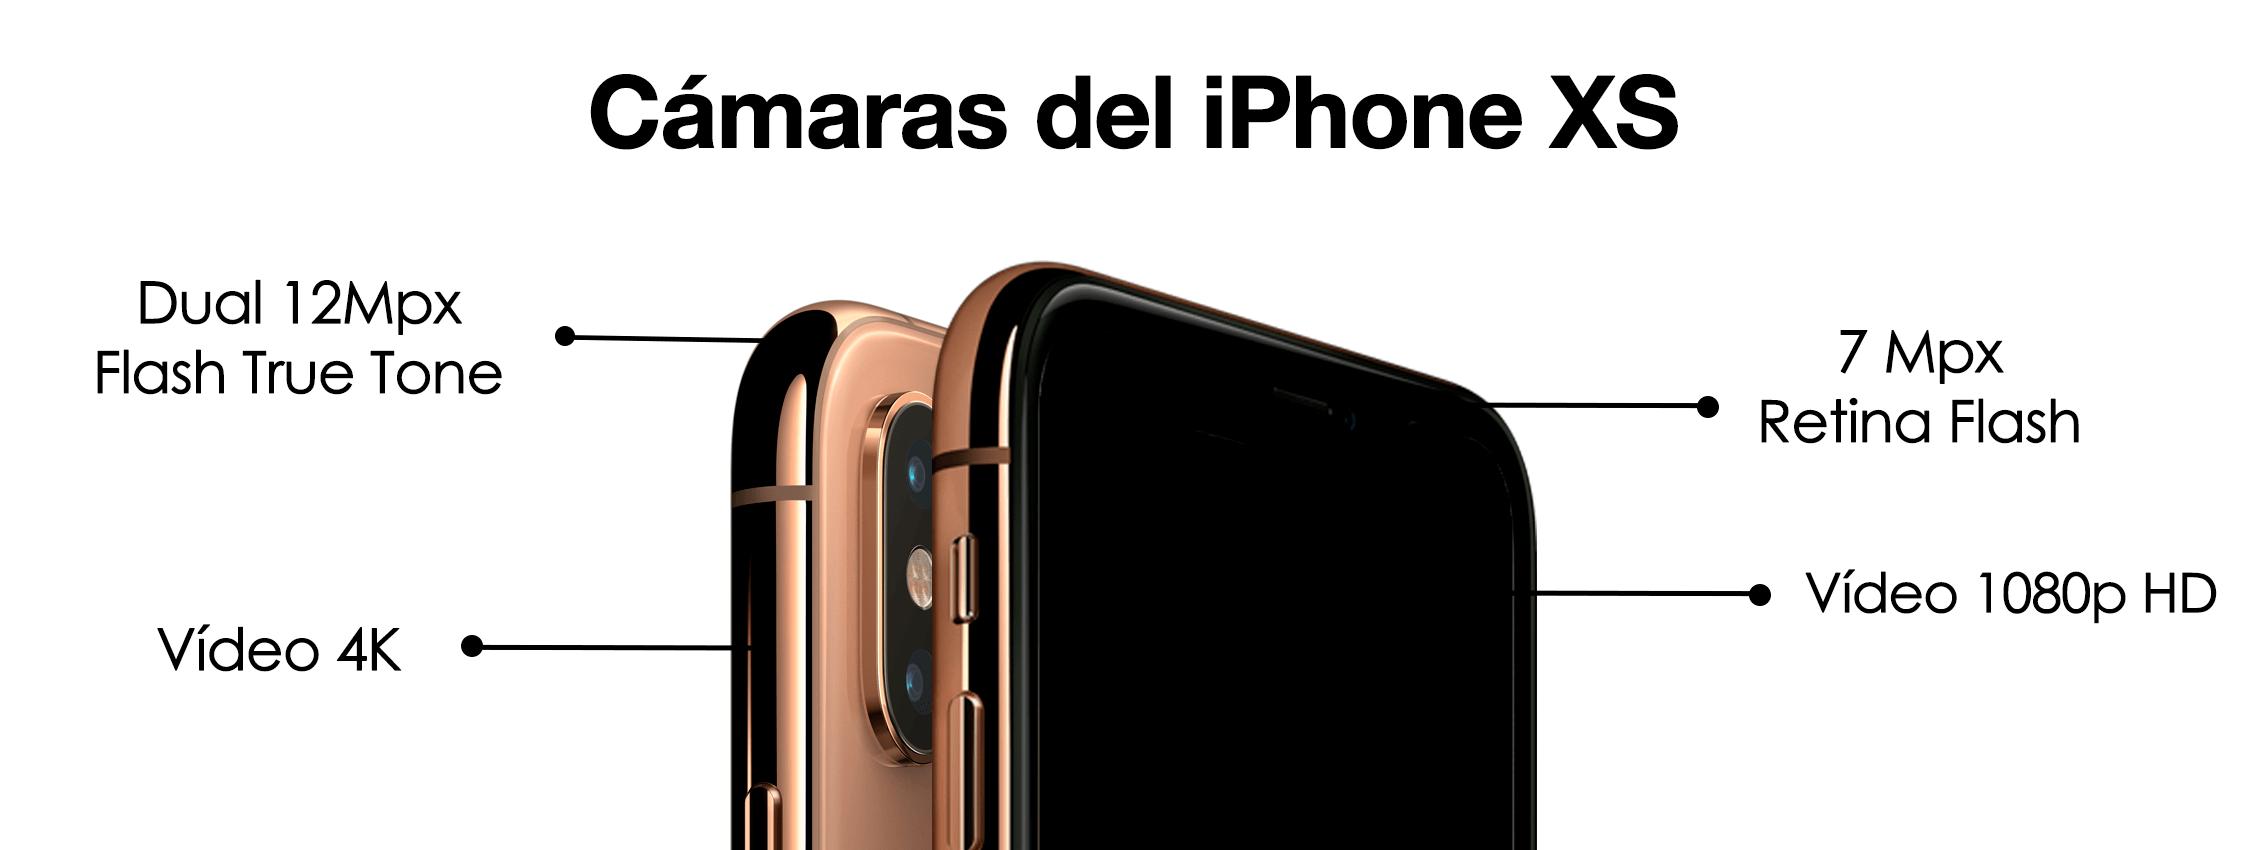 camara-iphone-xs